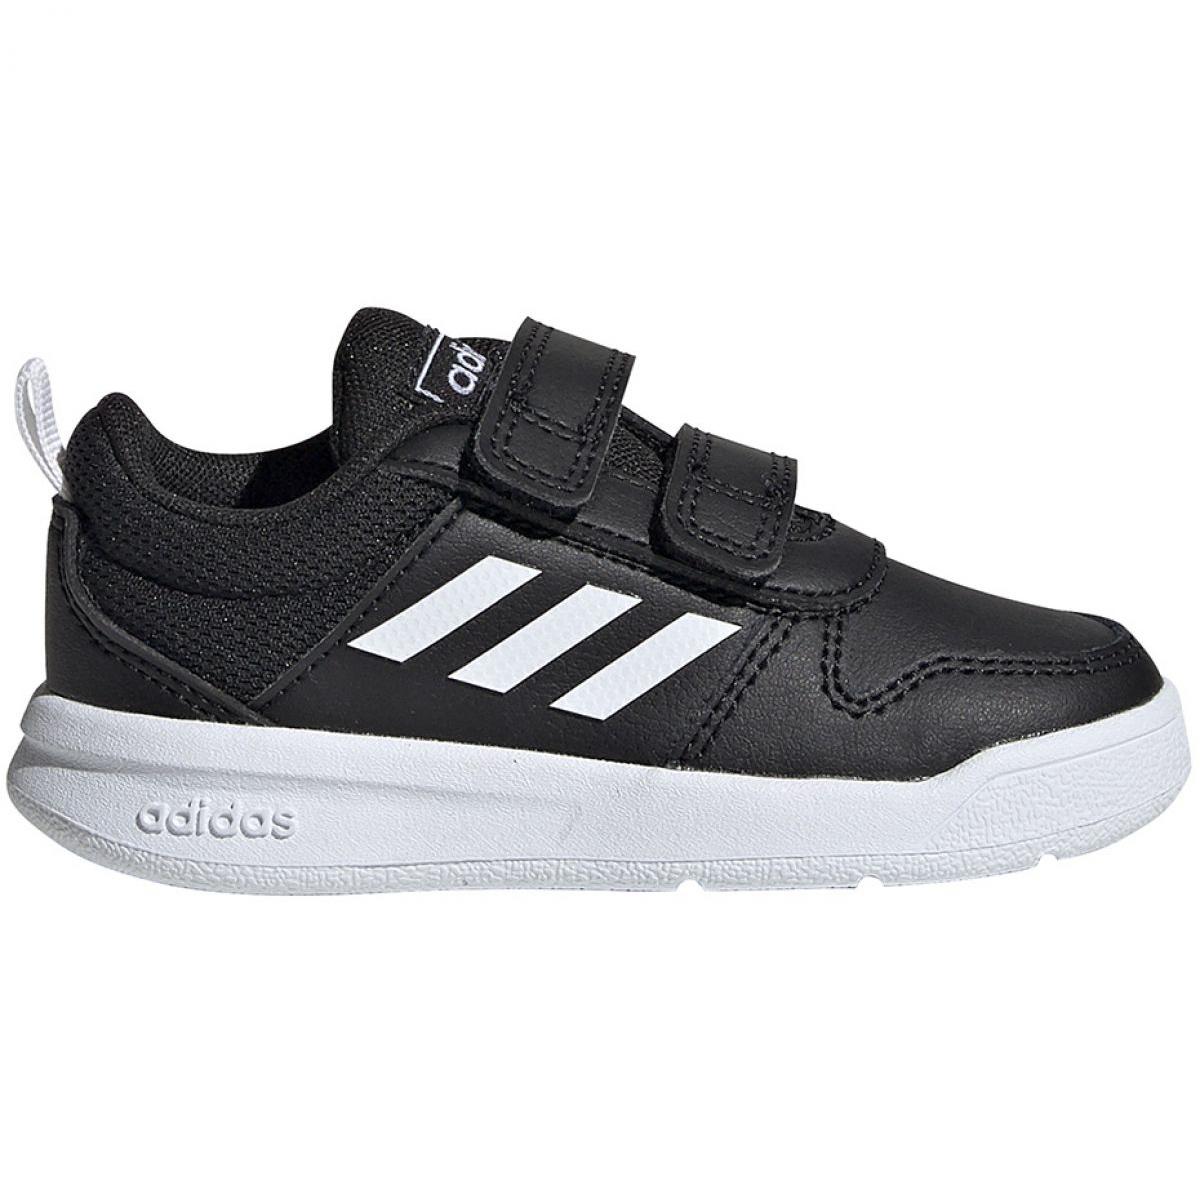 Adidas Tensaur I Jr EF1102 cipő fekete